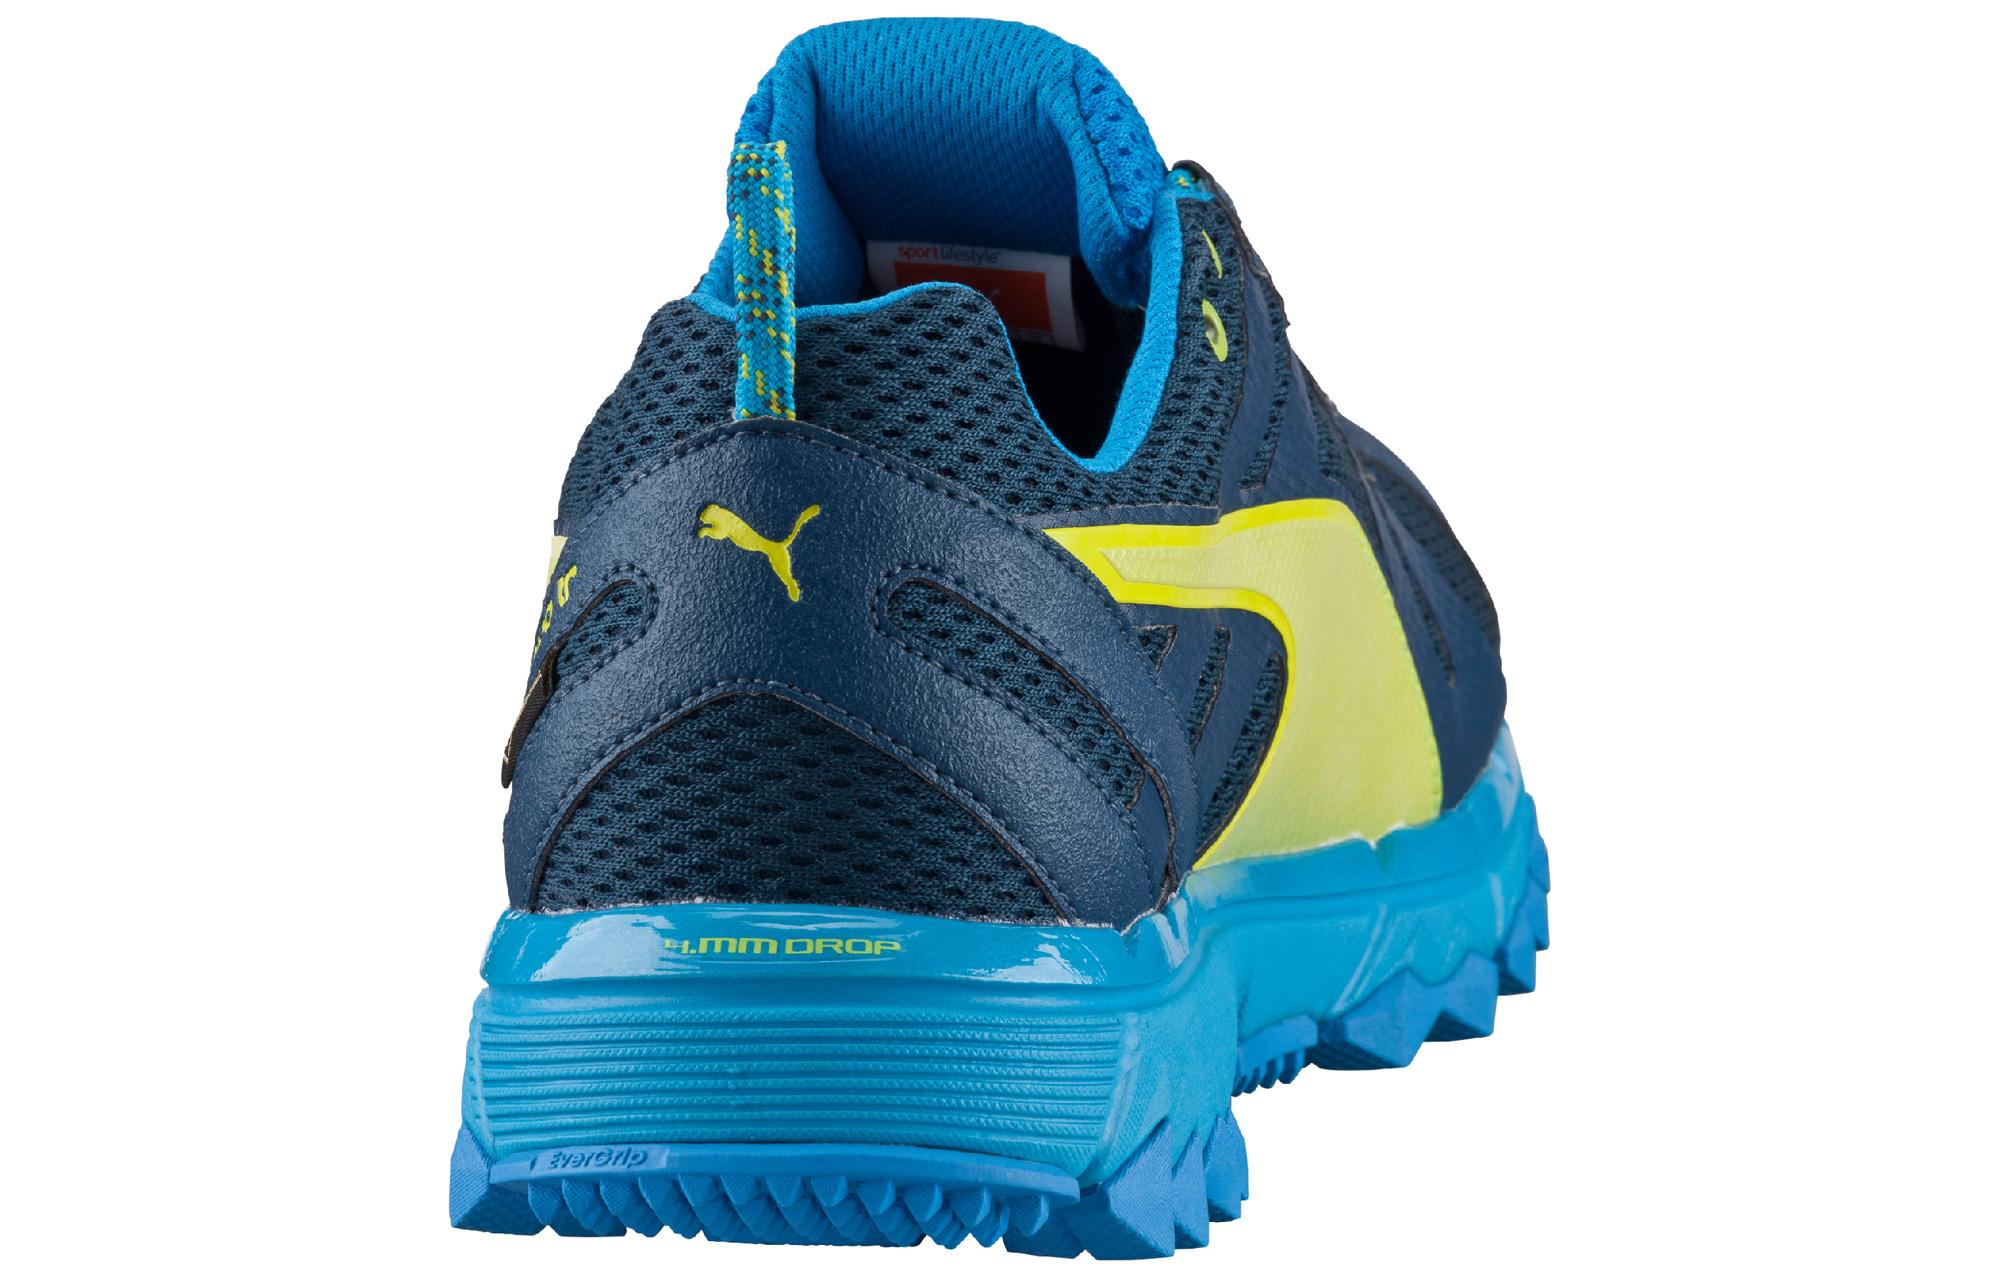 500 it Blu Gialle Scarpe V2 Tr Faas Puma Da Alltricks Trail Gtx® BwxPUq6I